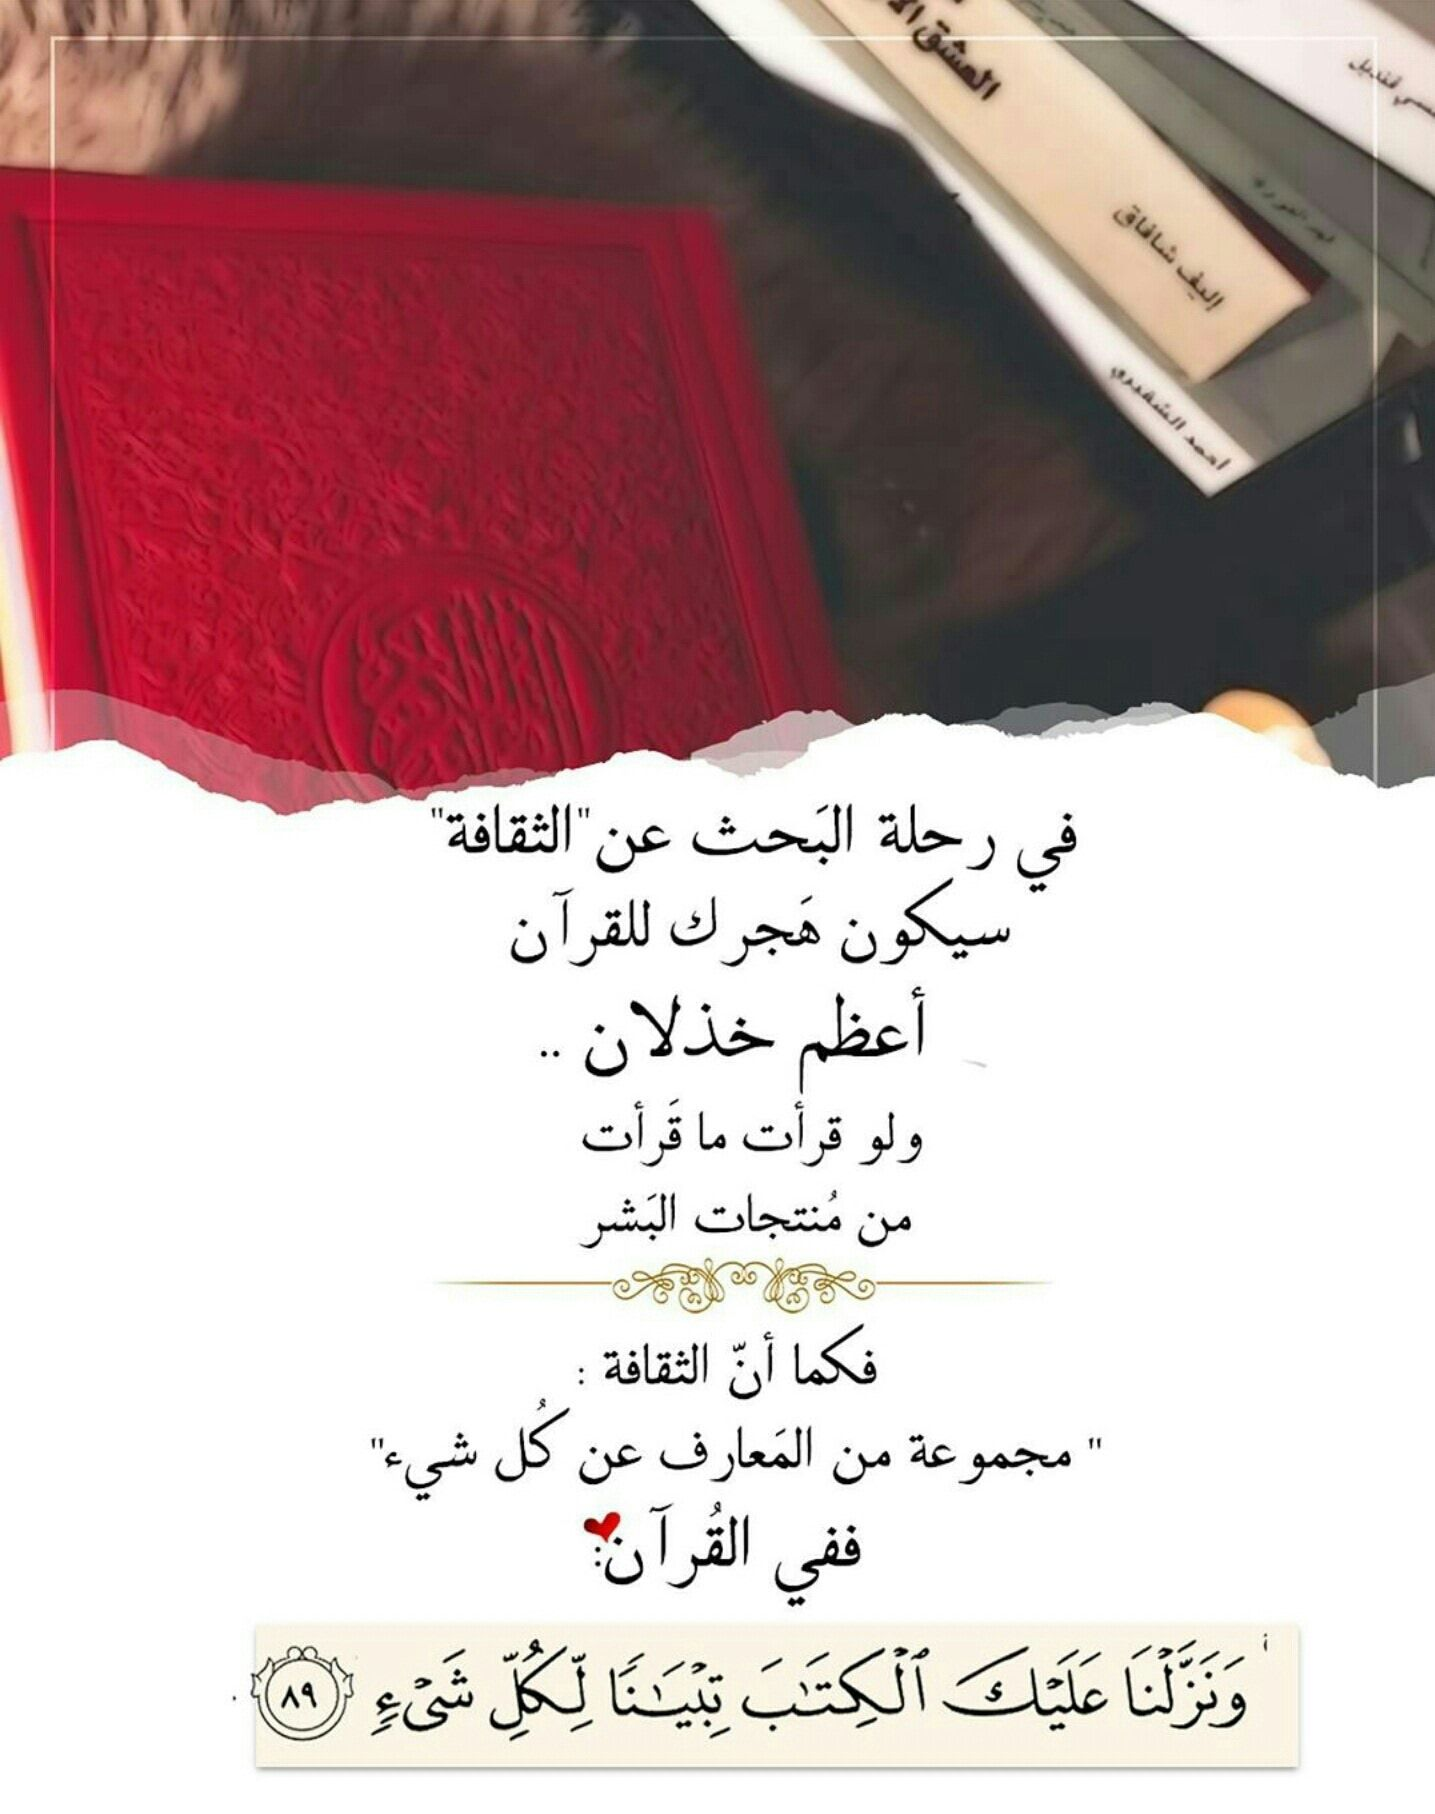 Pin By صورة و كلمة On مواعظ خواطر إسلامية Ex Quotes Islam Facts Islam Marriage